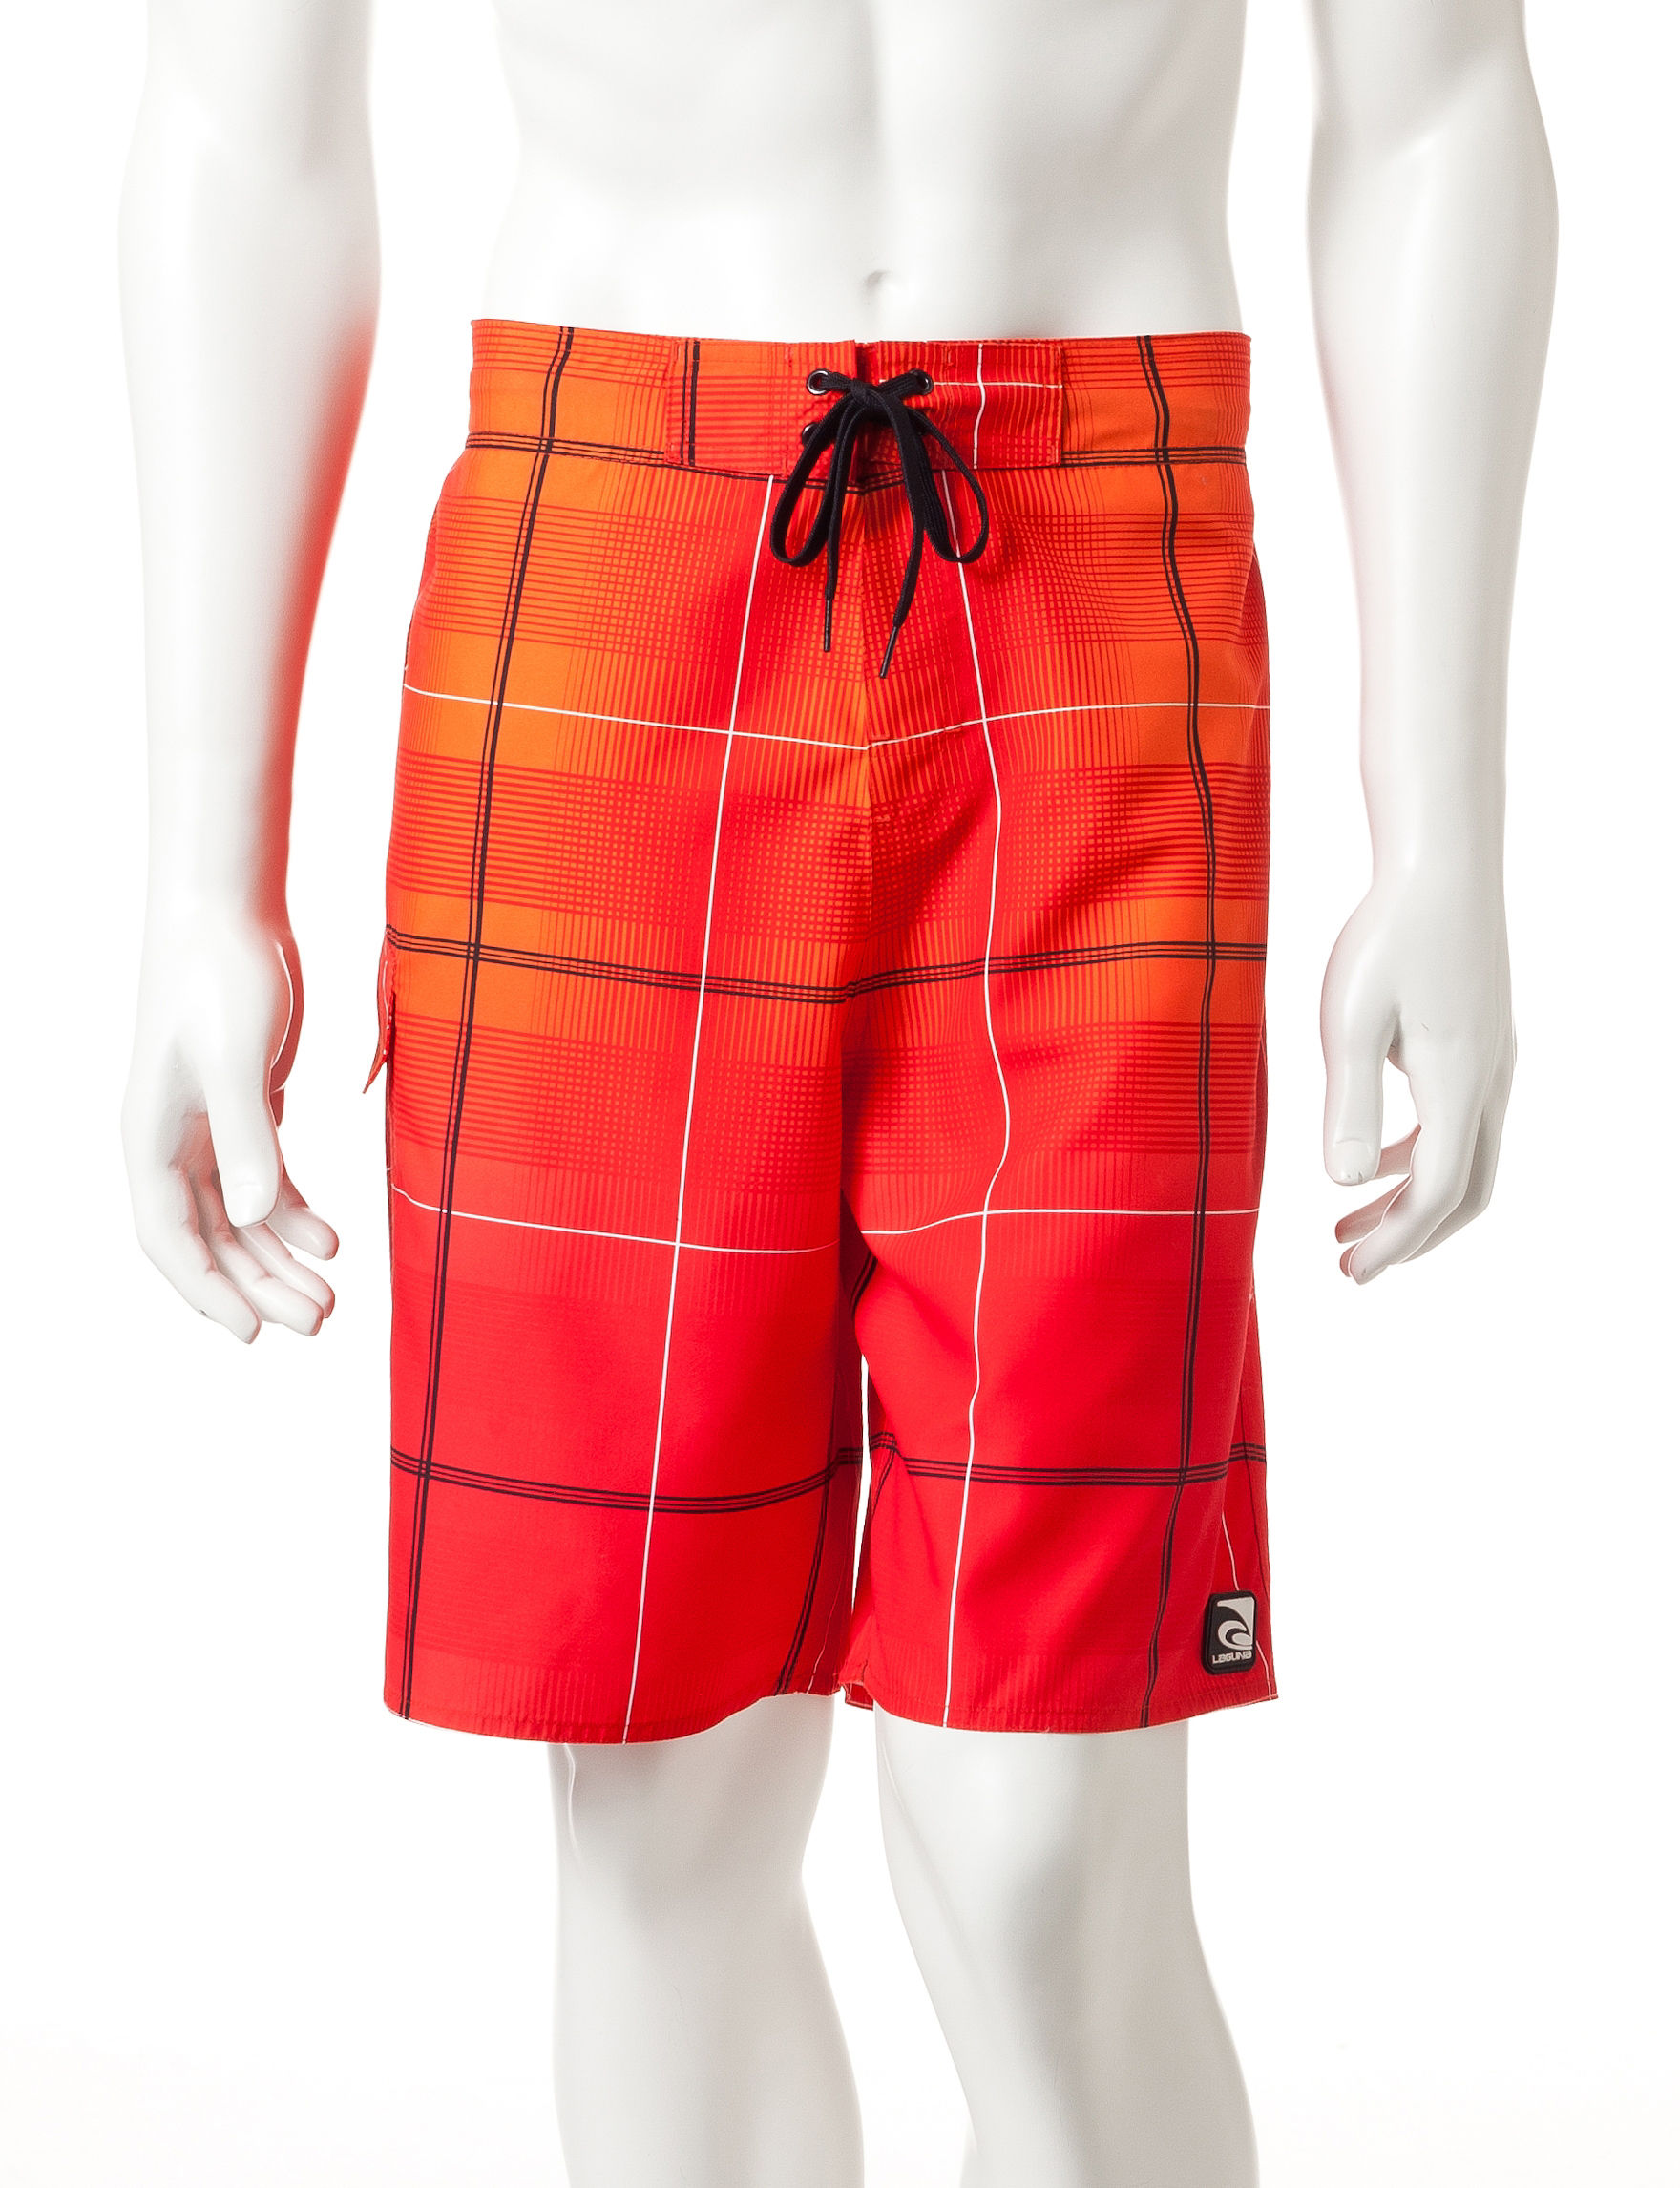 Laguna Red Swimsuit Bottoms